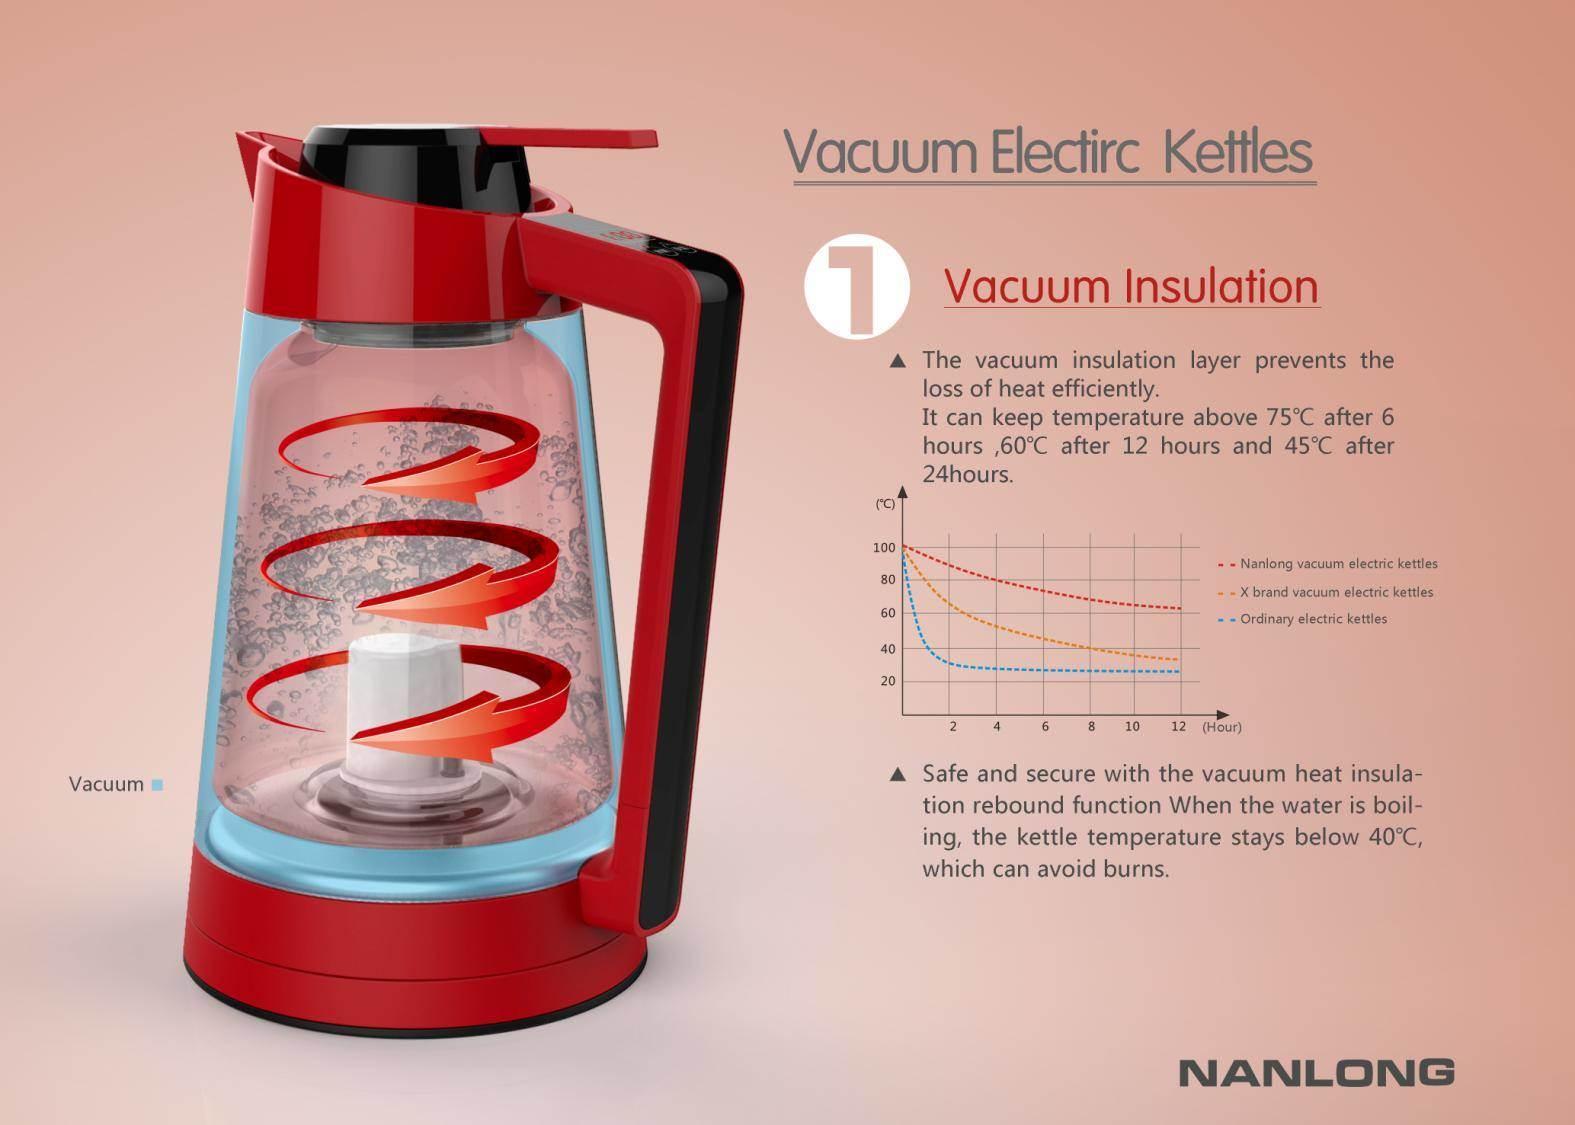 Vacuum Electric Kettle